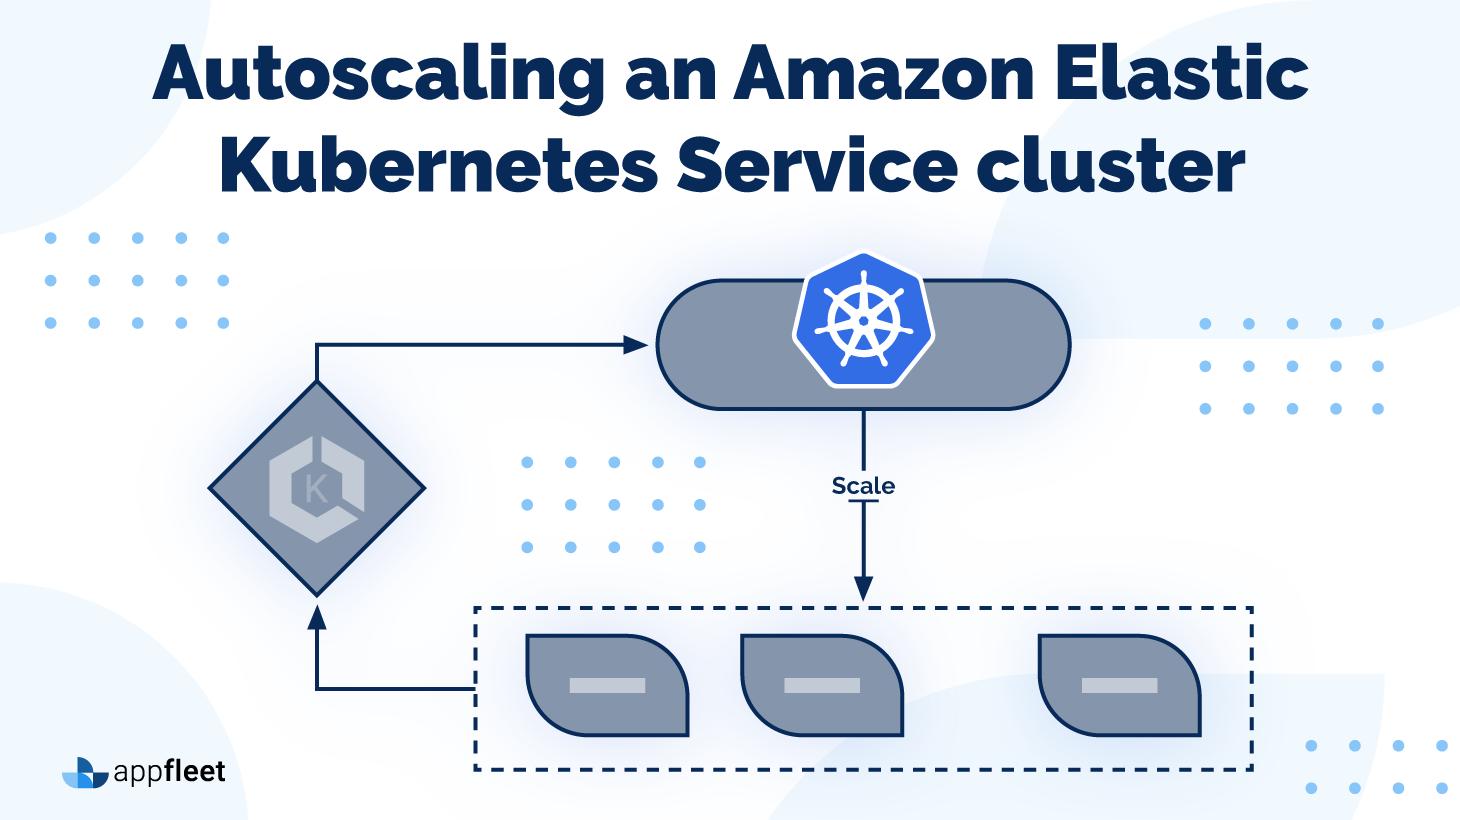 Autoscaling an Amazon Elastic Kubernetes Service cluster